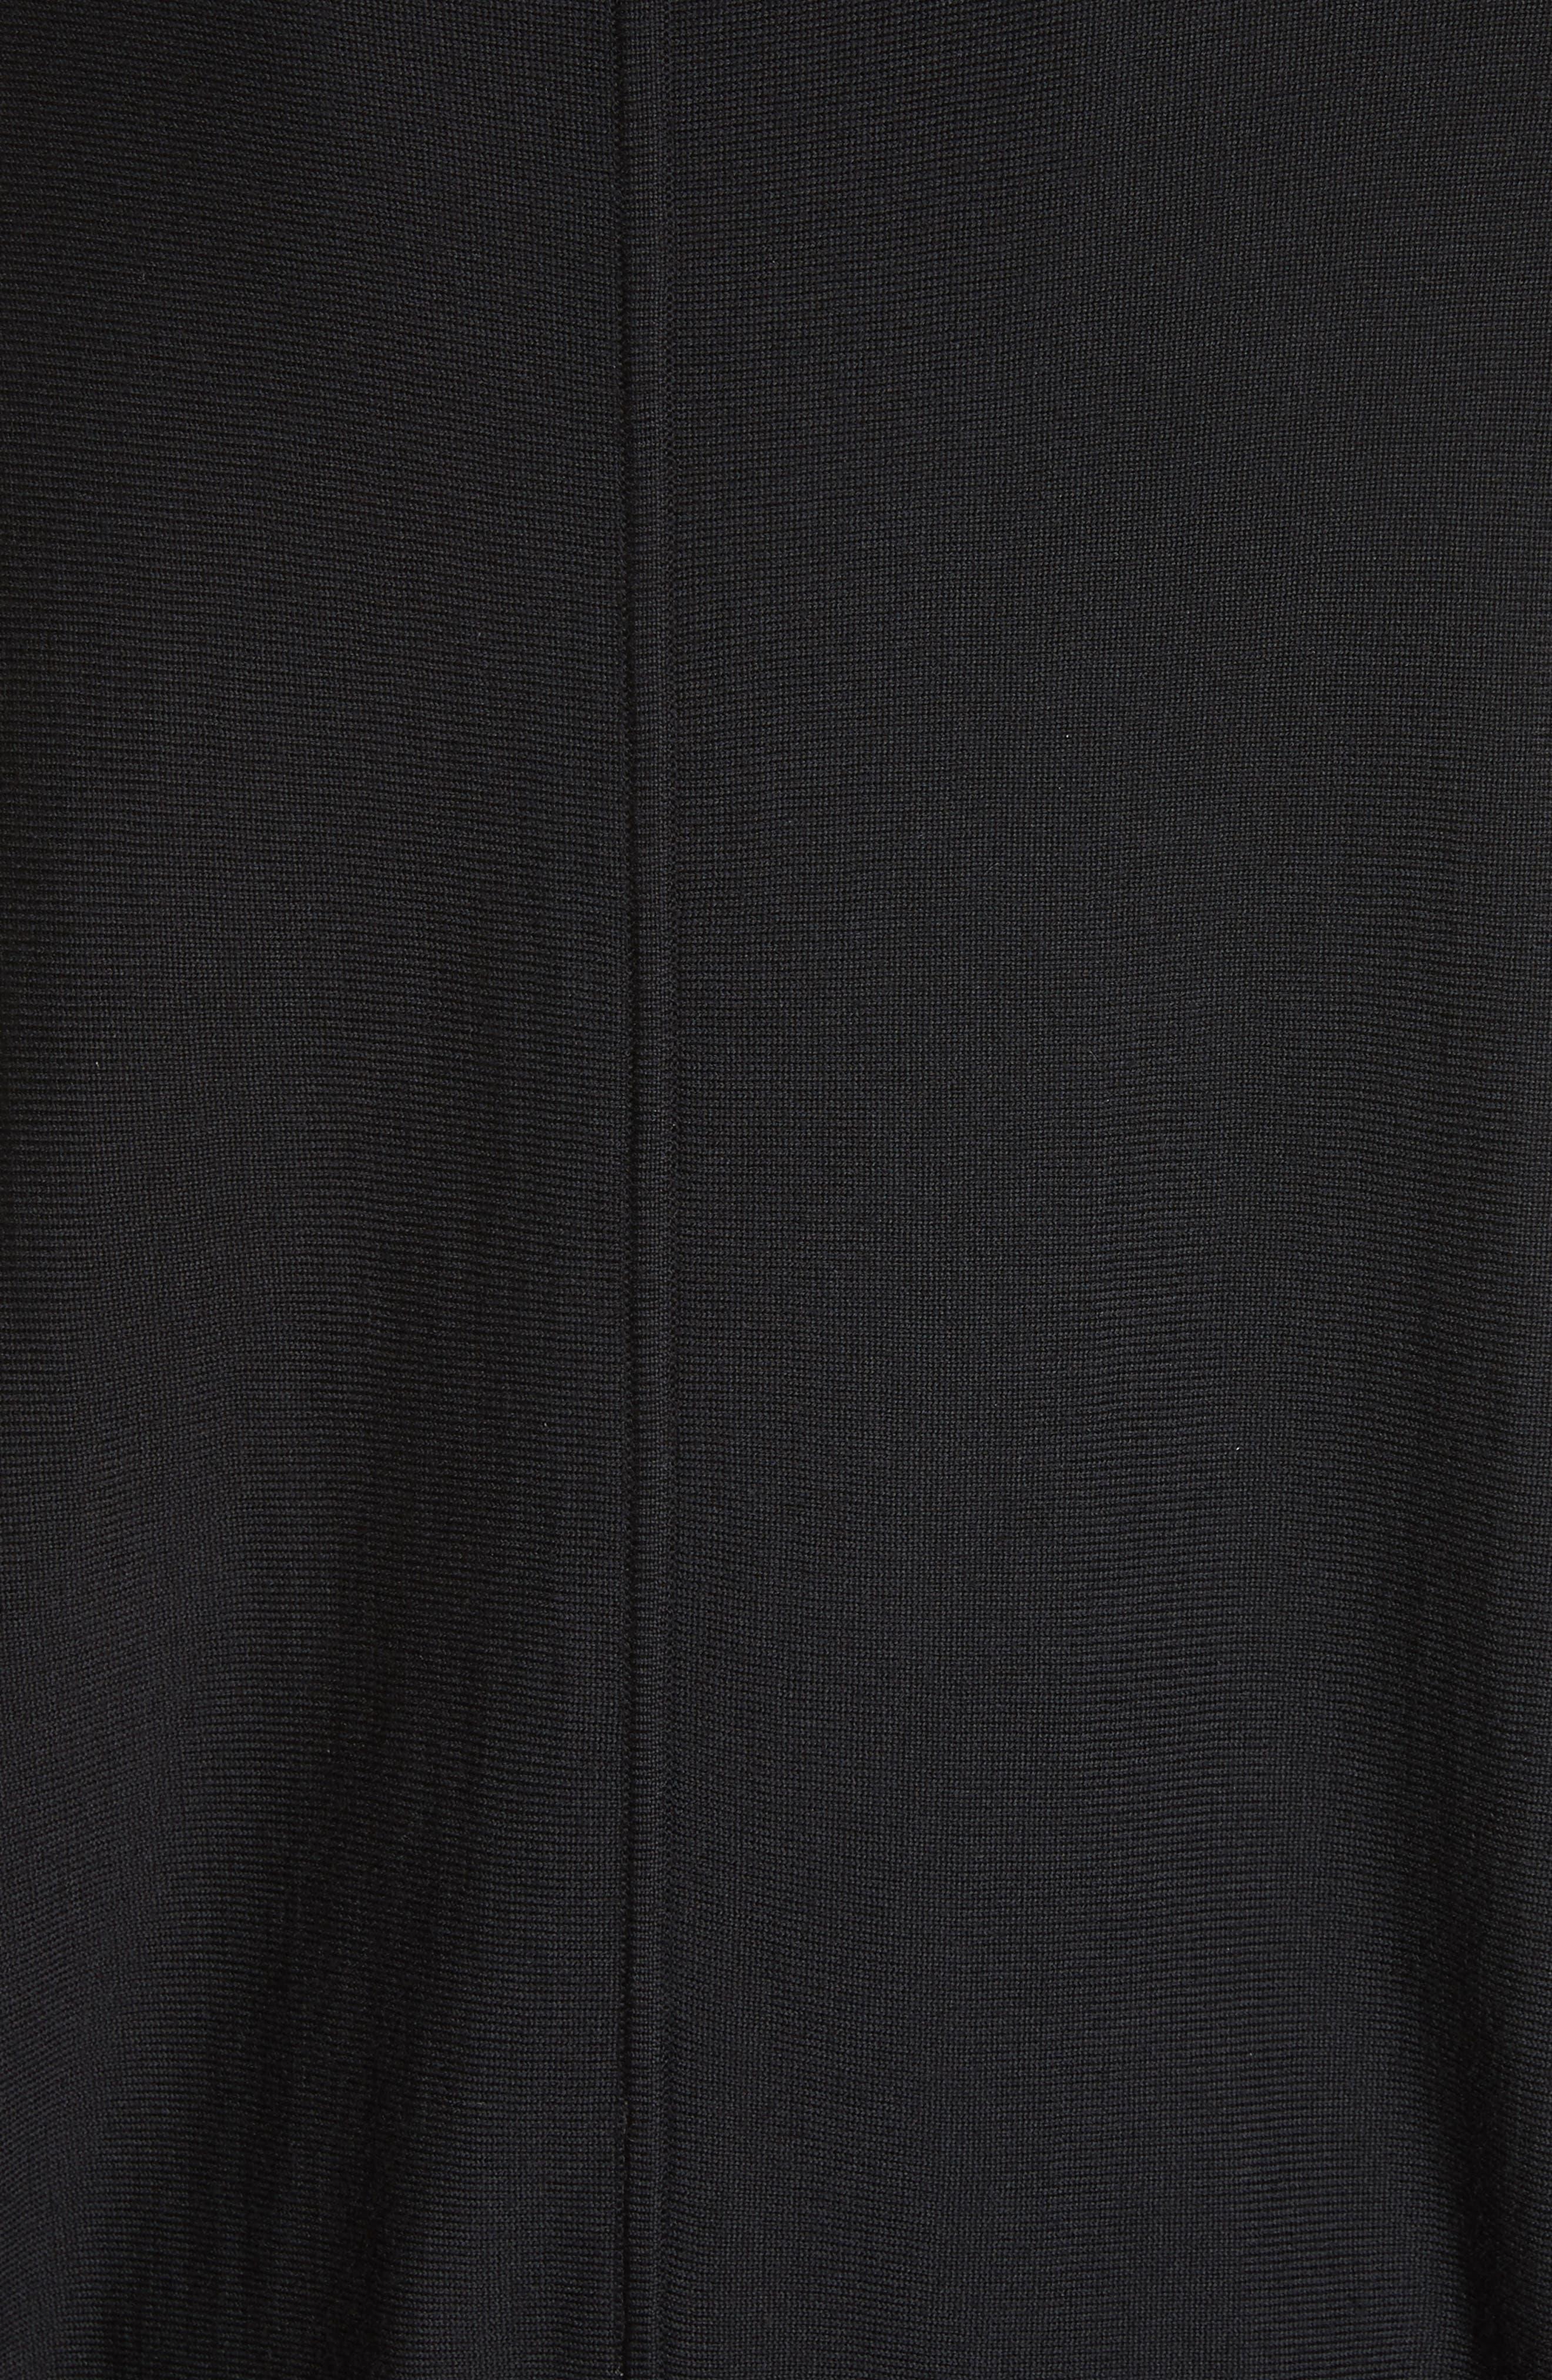 Rib Knit Poncho Sweater,                             Alternate thumbnail 5, color,                             001